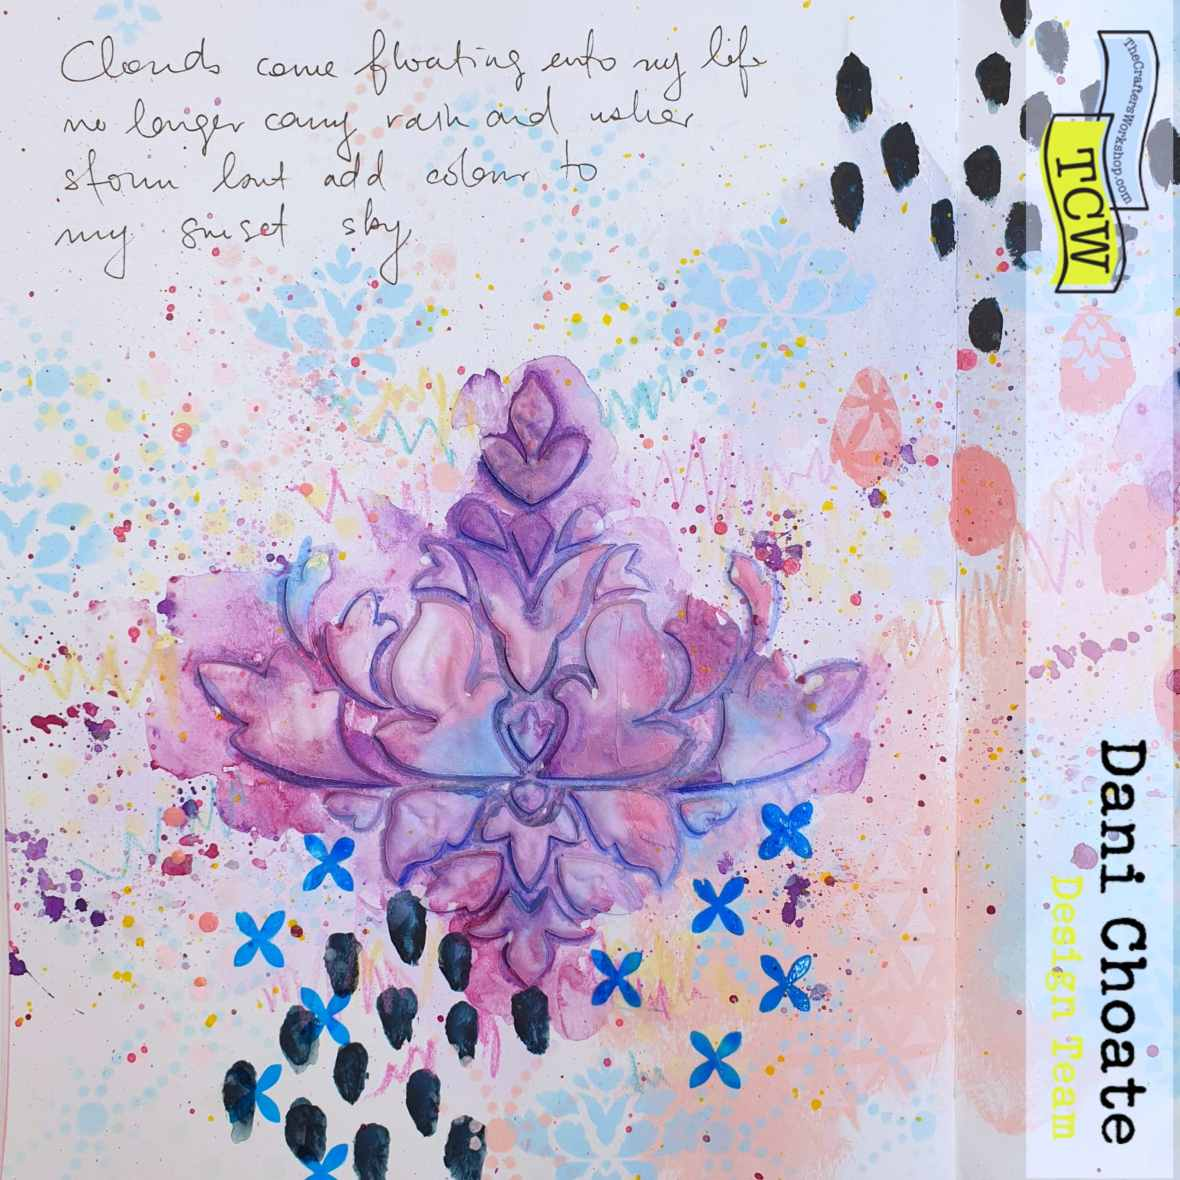 Clouds - Art Journal Page TCW794 - Damask Decor